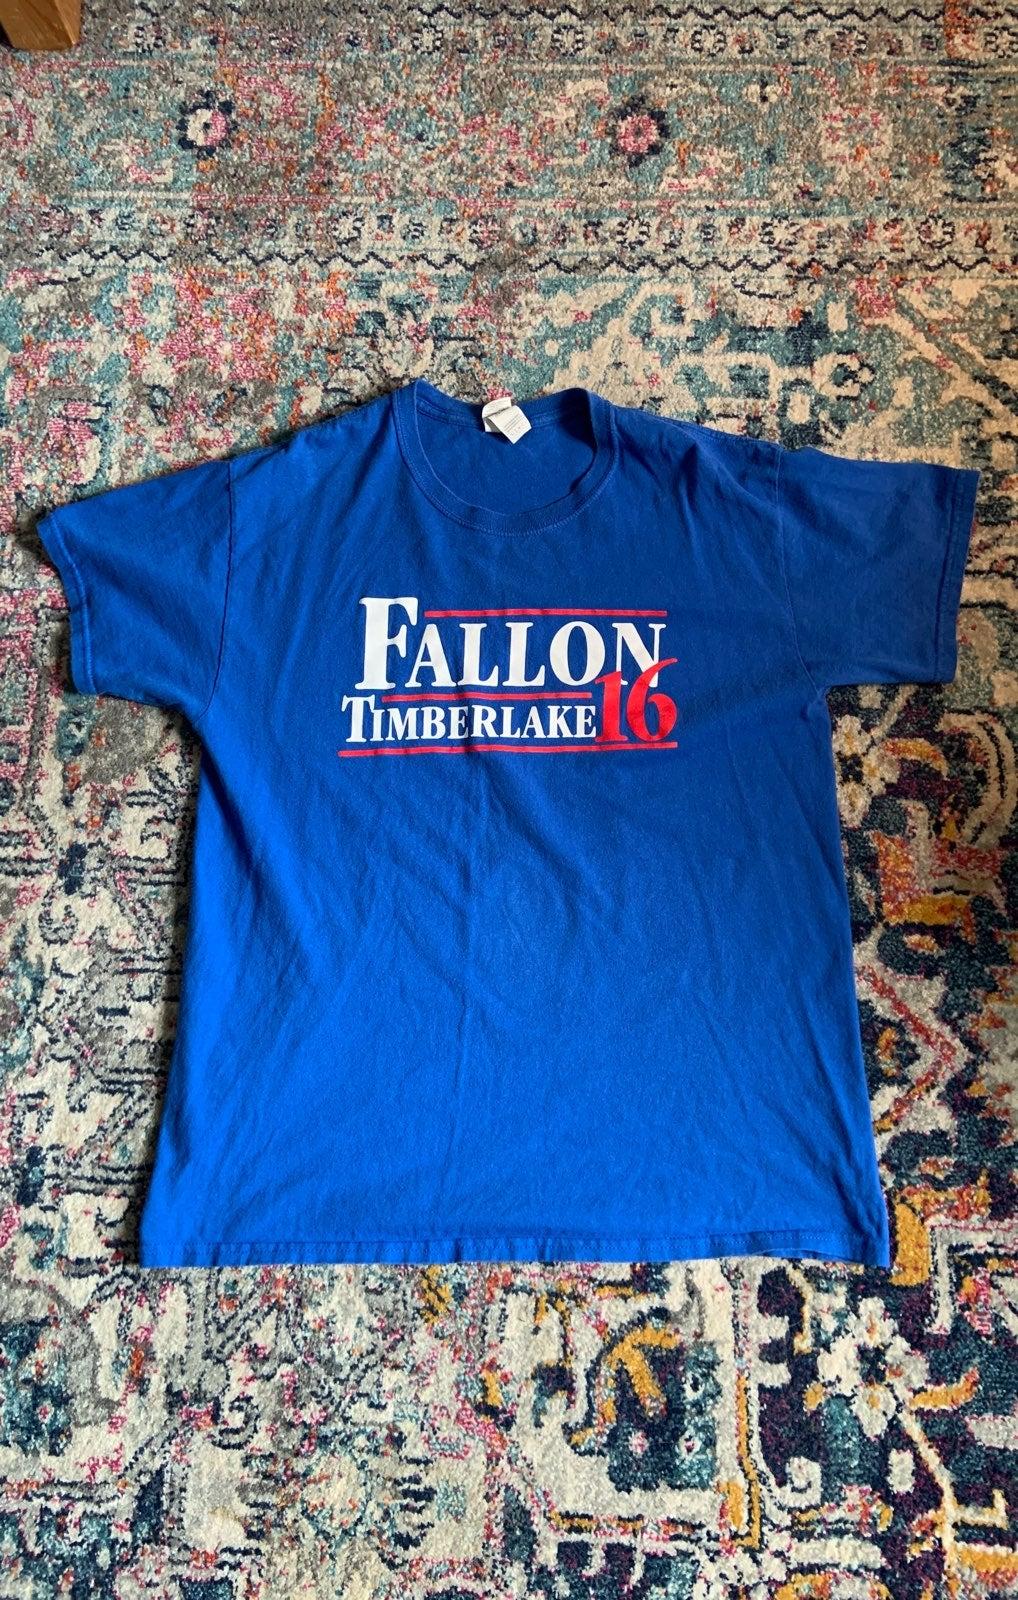 Fallon Timberlake Tshirt